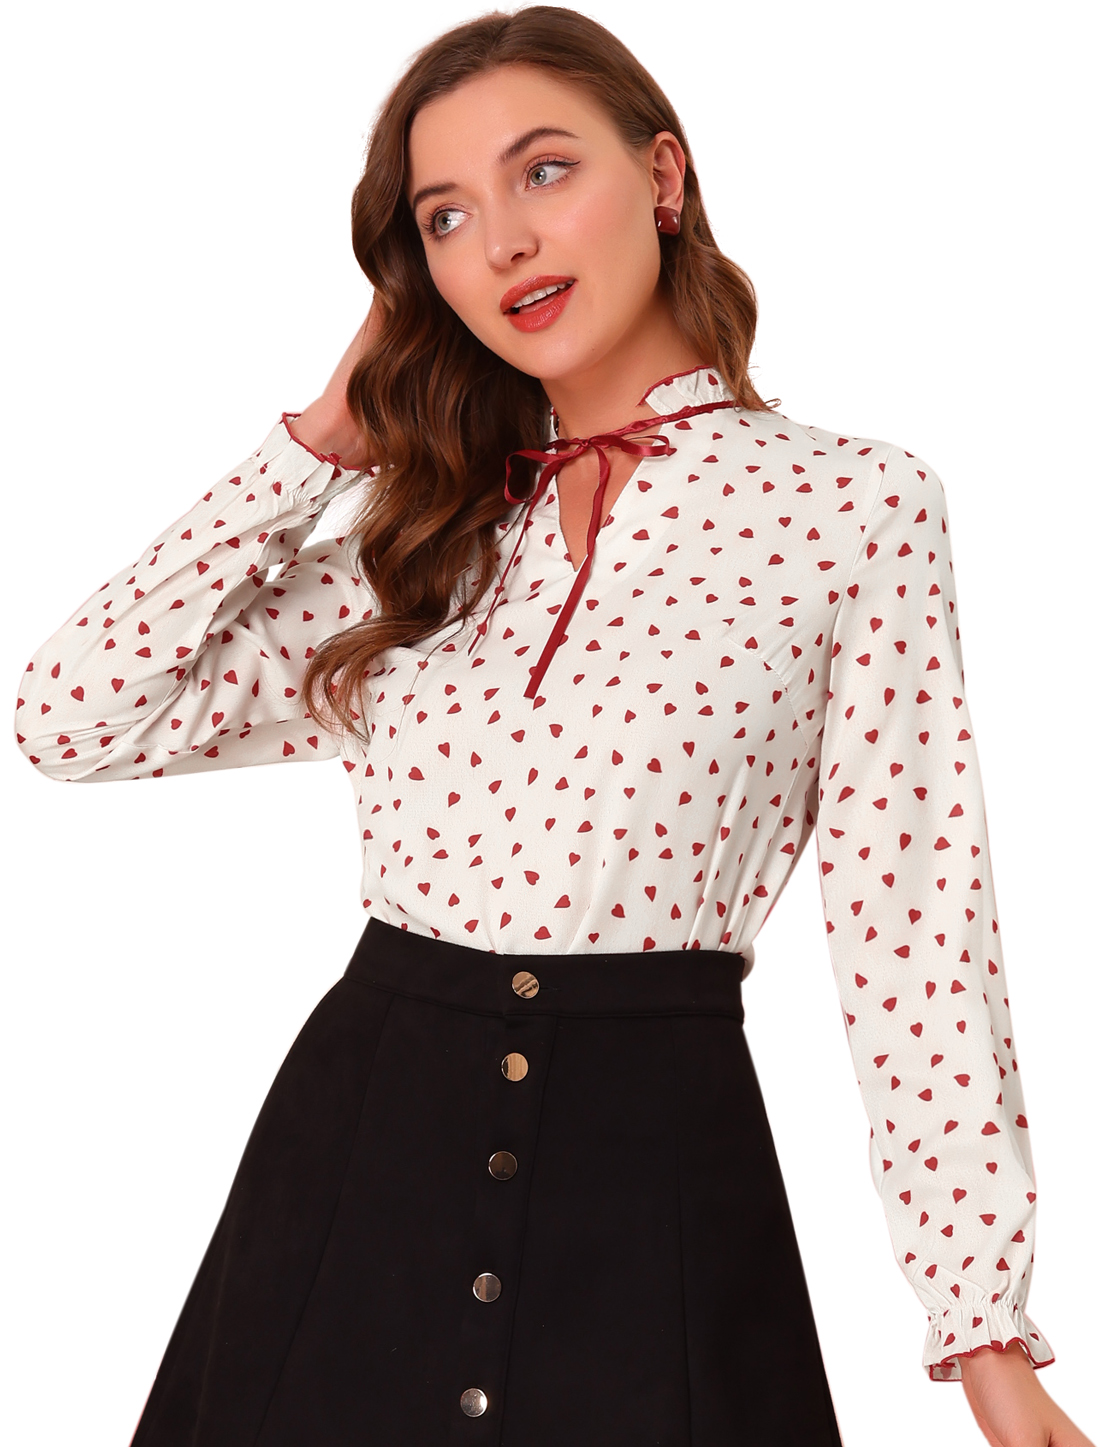 Allegra K Women's Tie Ruffled Neck Polka Dots Blouse Tops Beige Red M